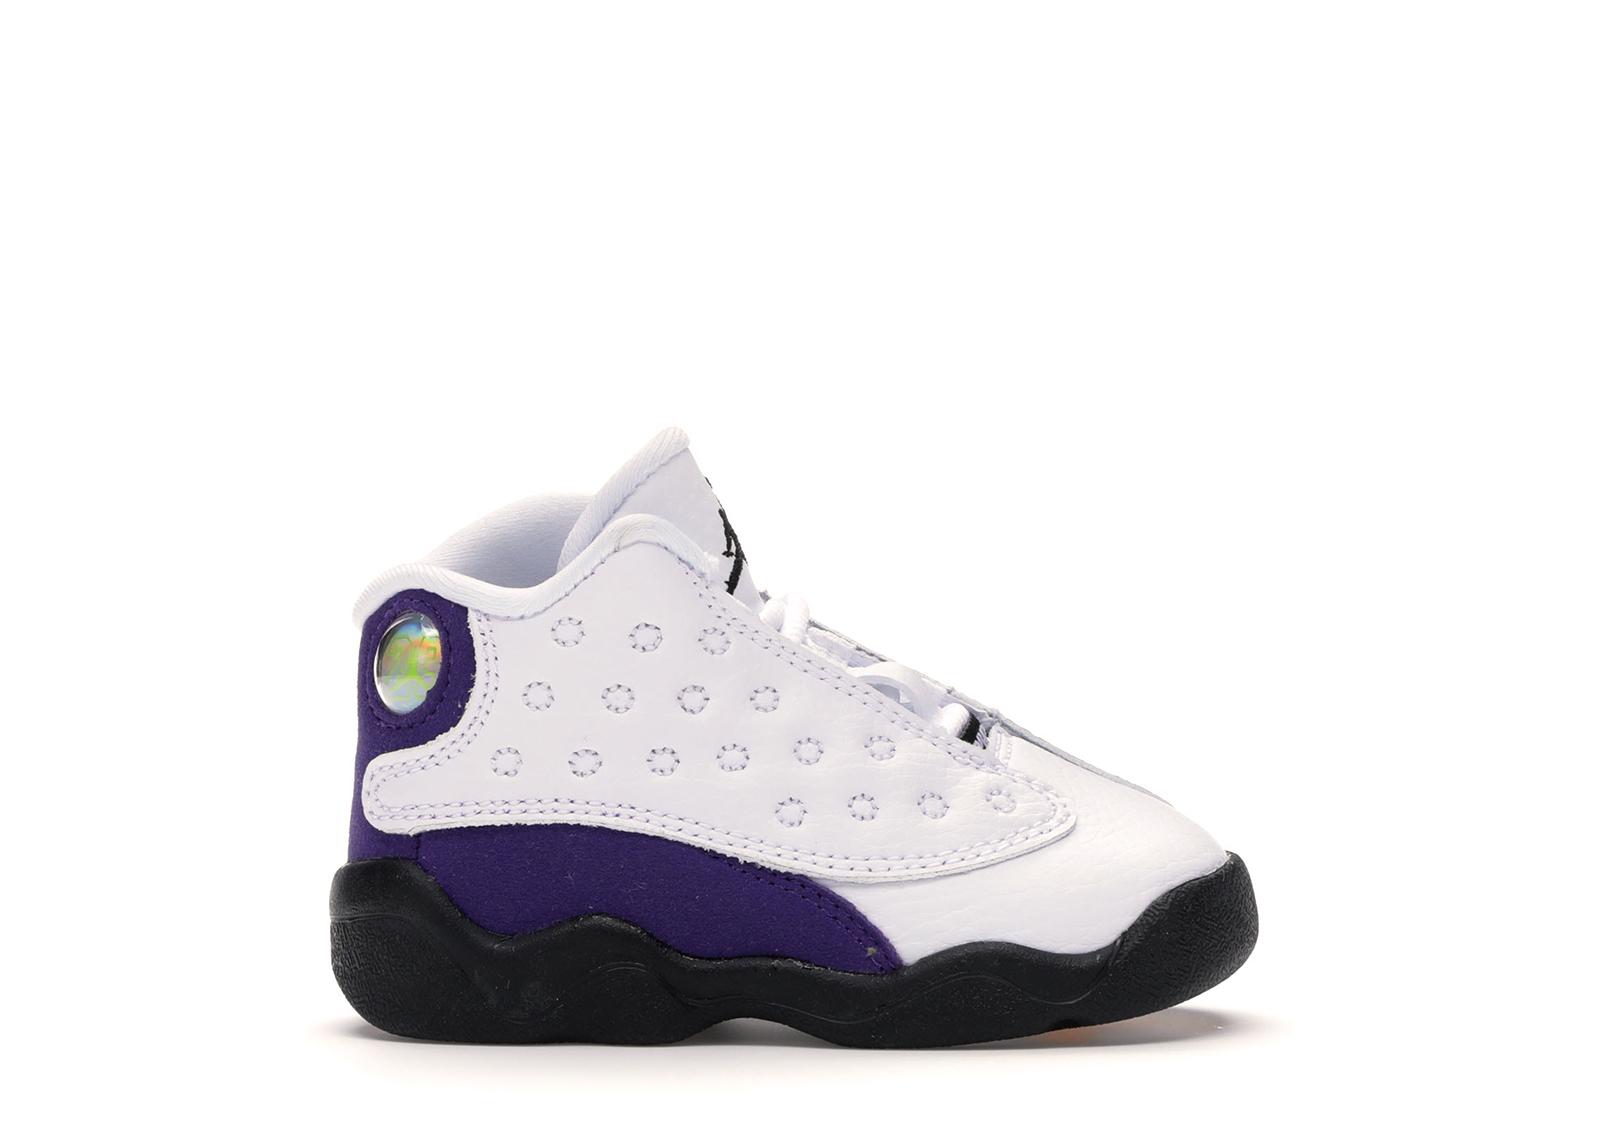 Jordan 13 Retro Lakers (TD)